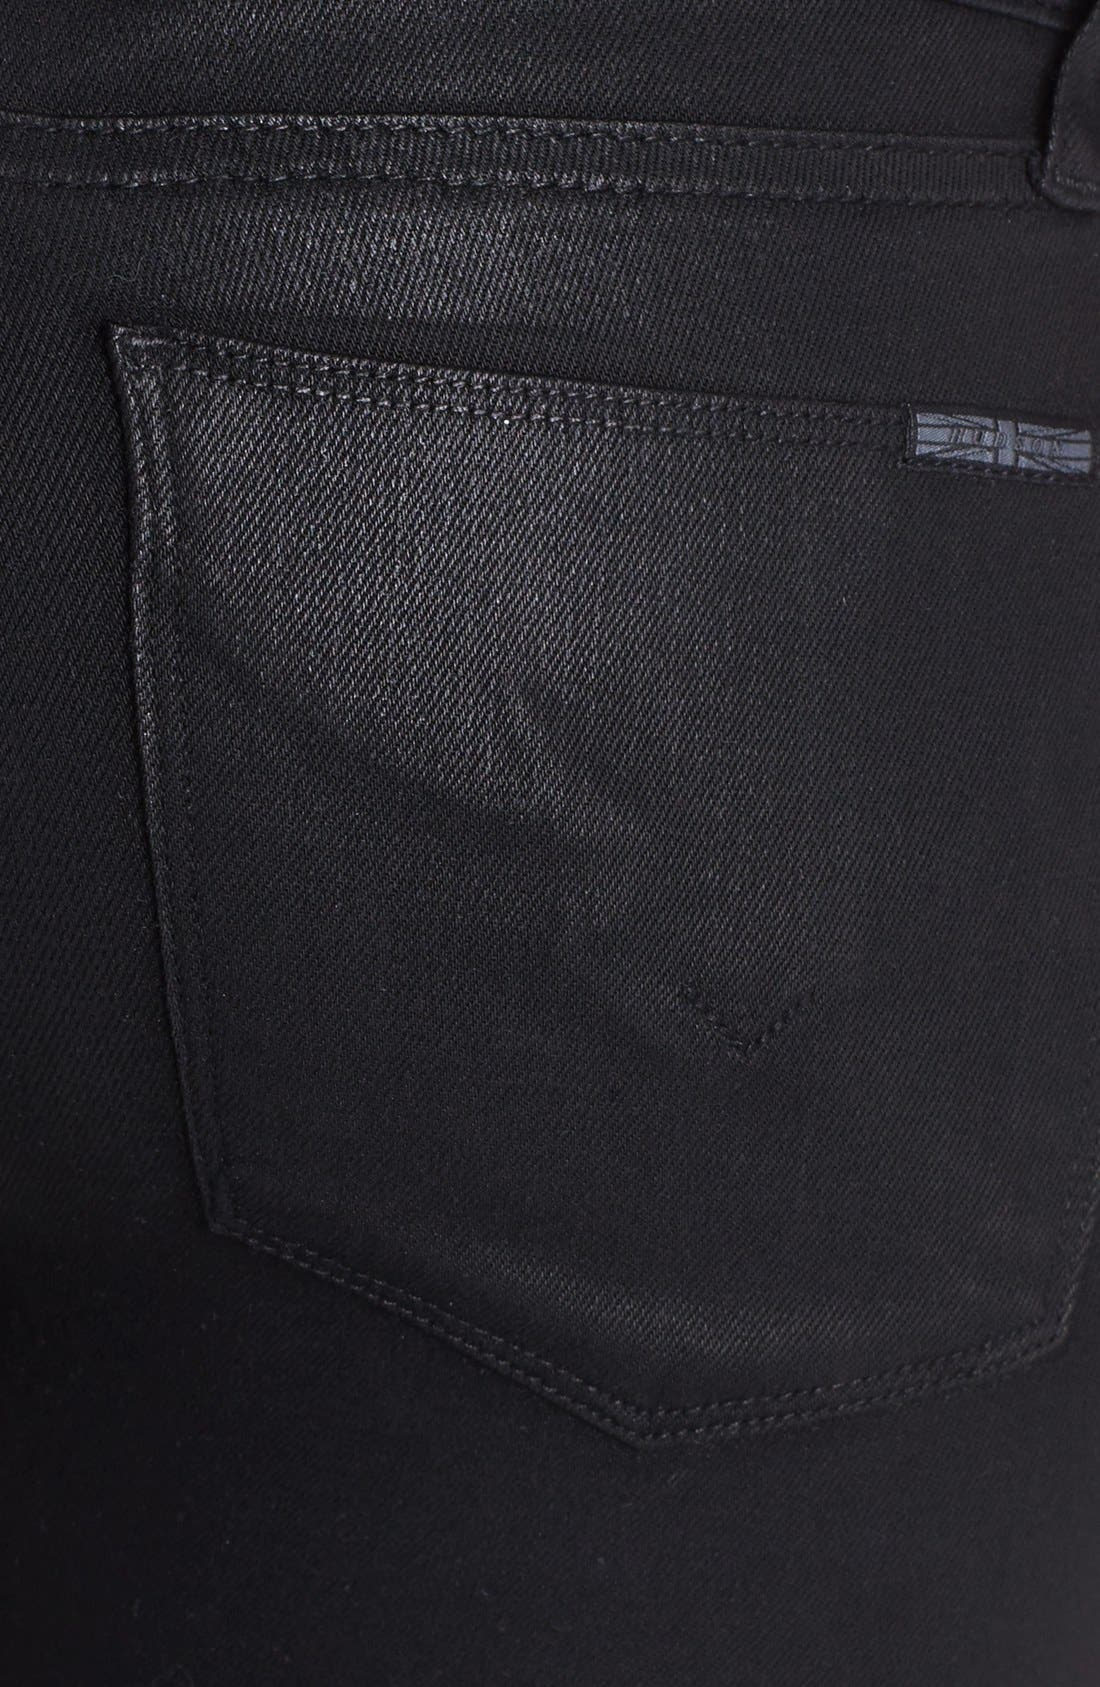 Alternate Image 3  - Hudson Jeans 'Stark' Moto Skinny Jeans (Jet Black)